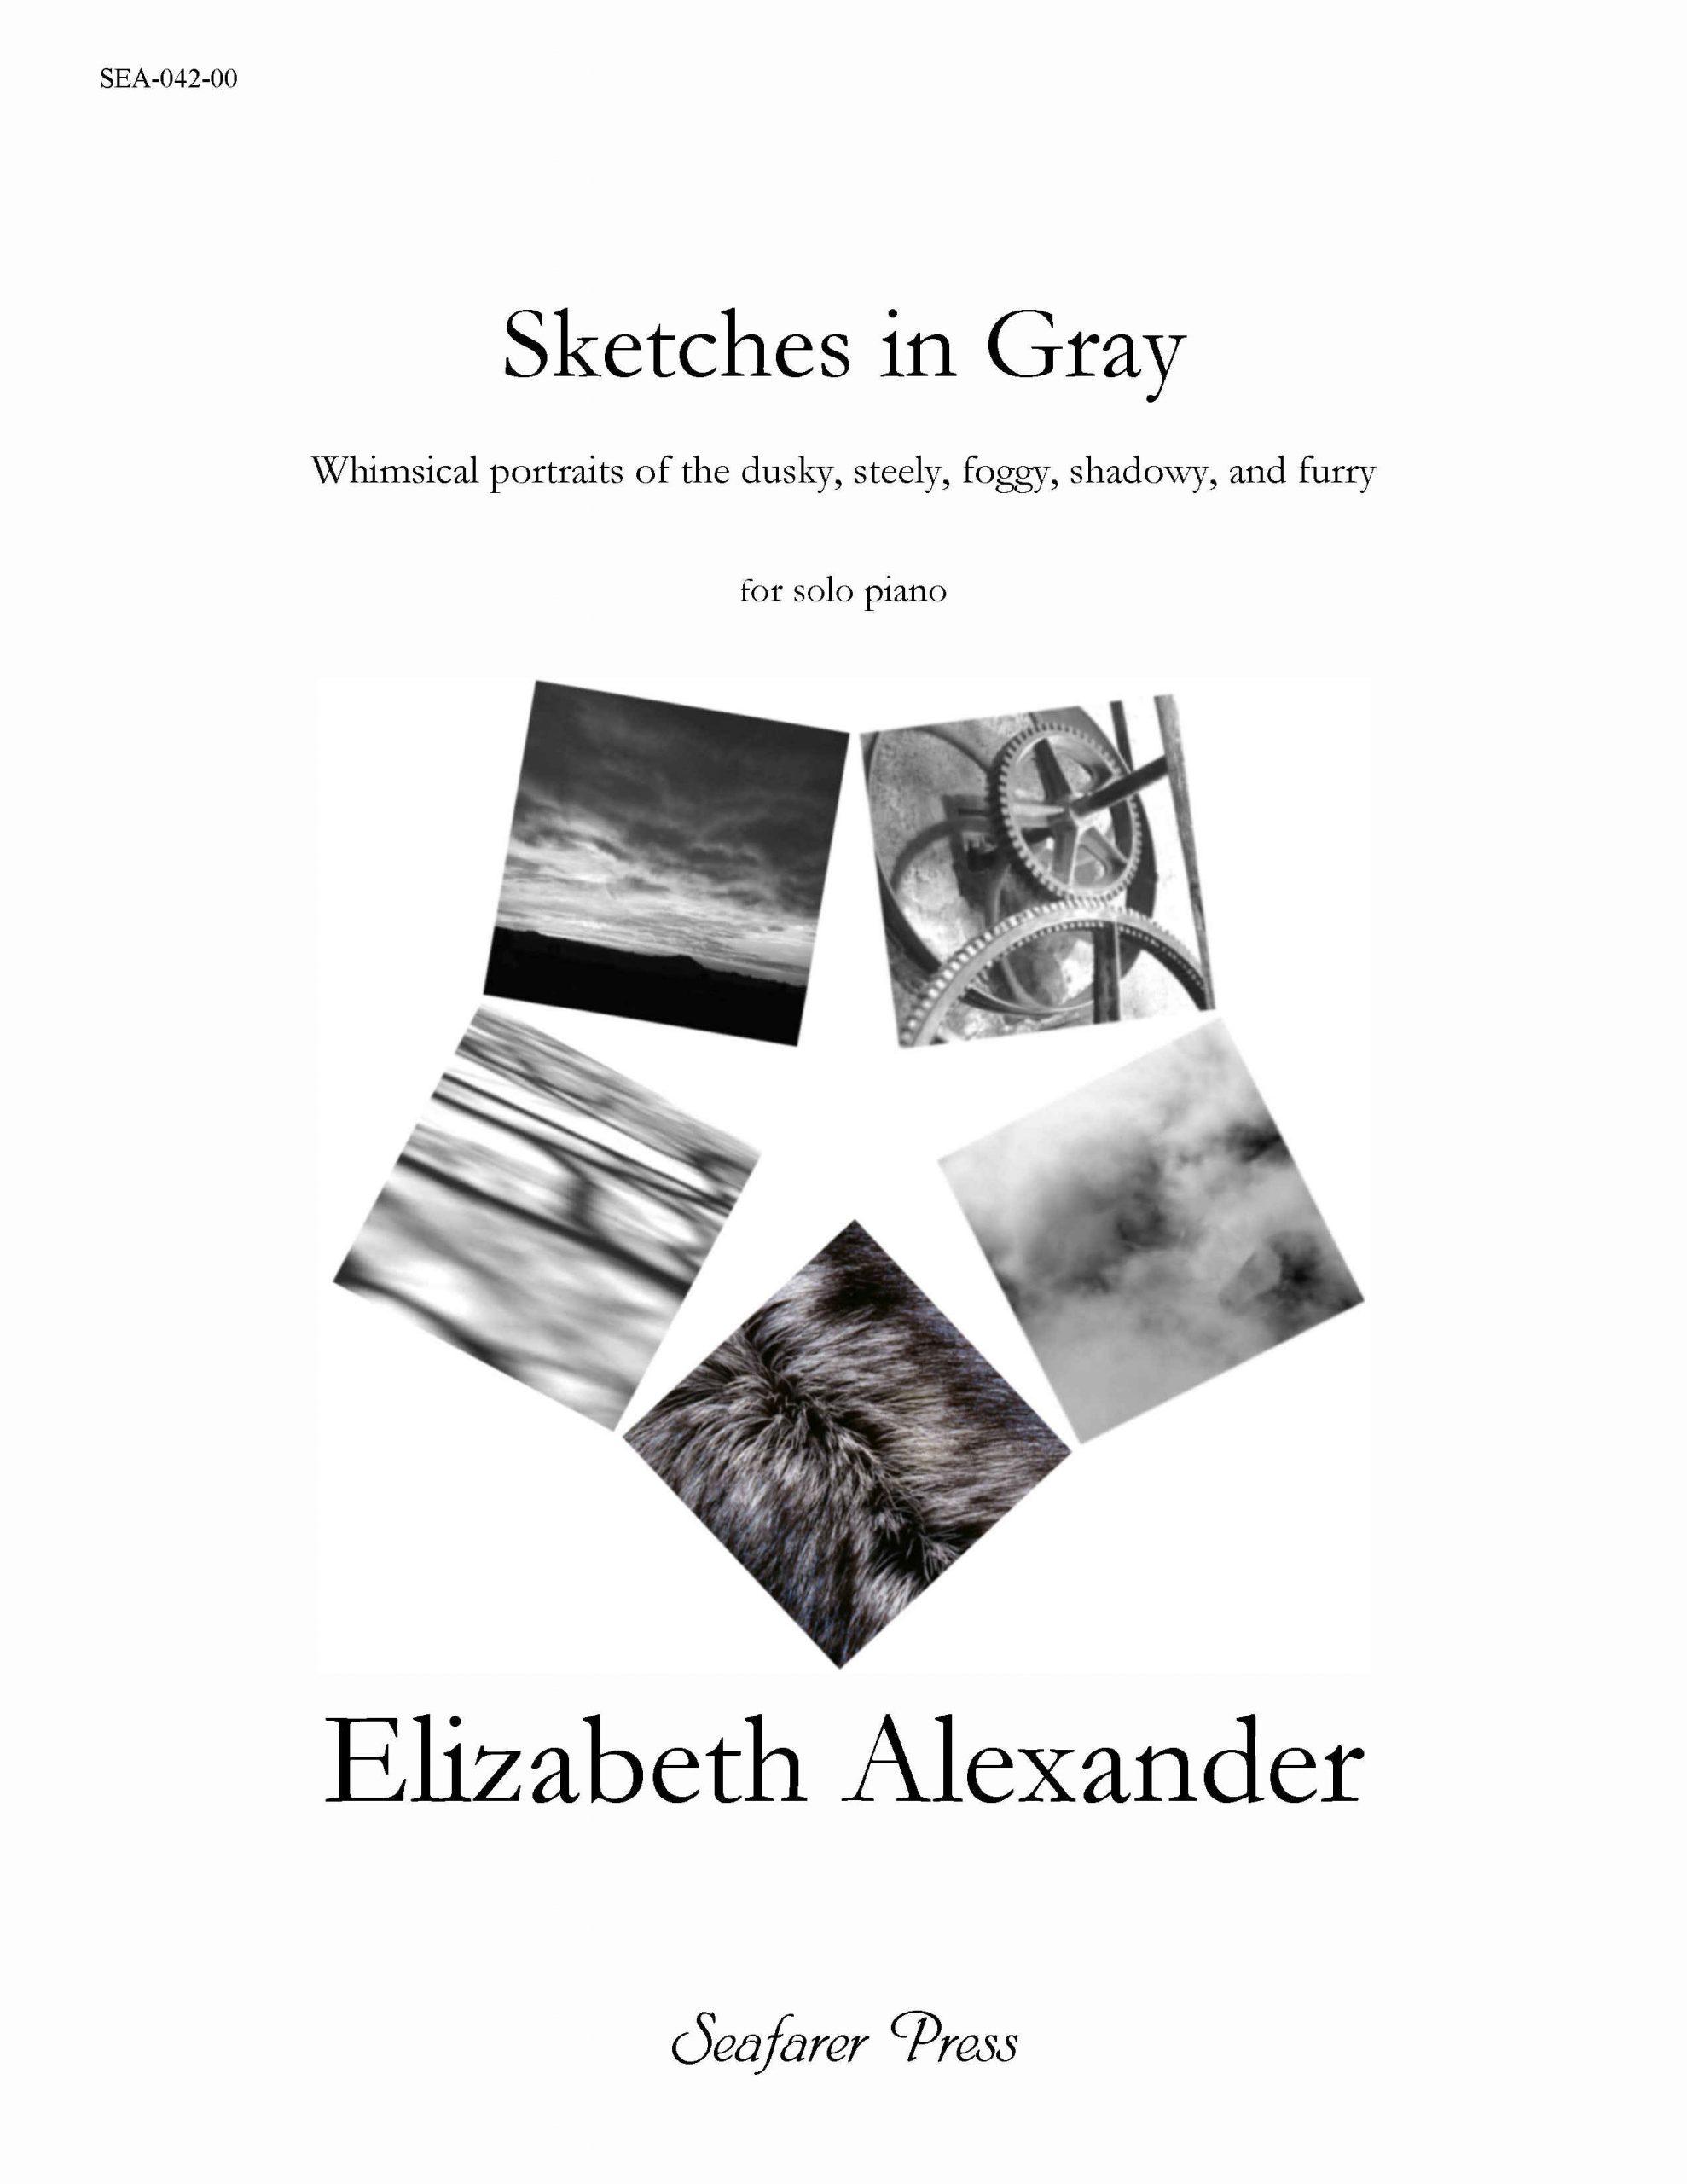 SEA-042-00 - Sketches in Gray